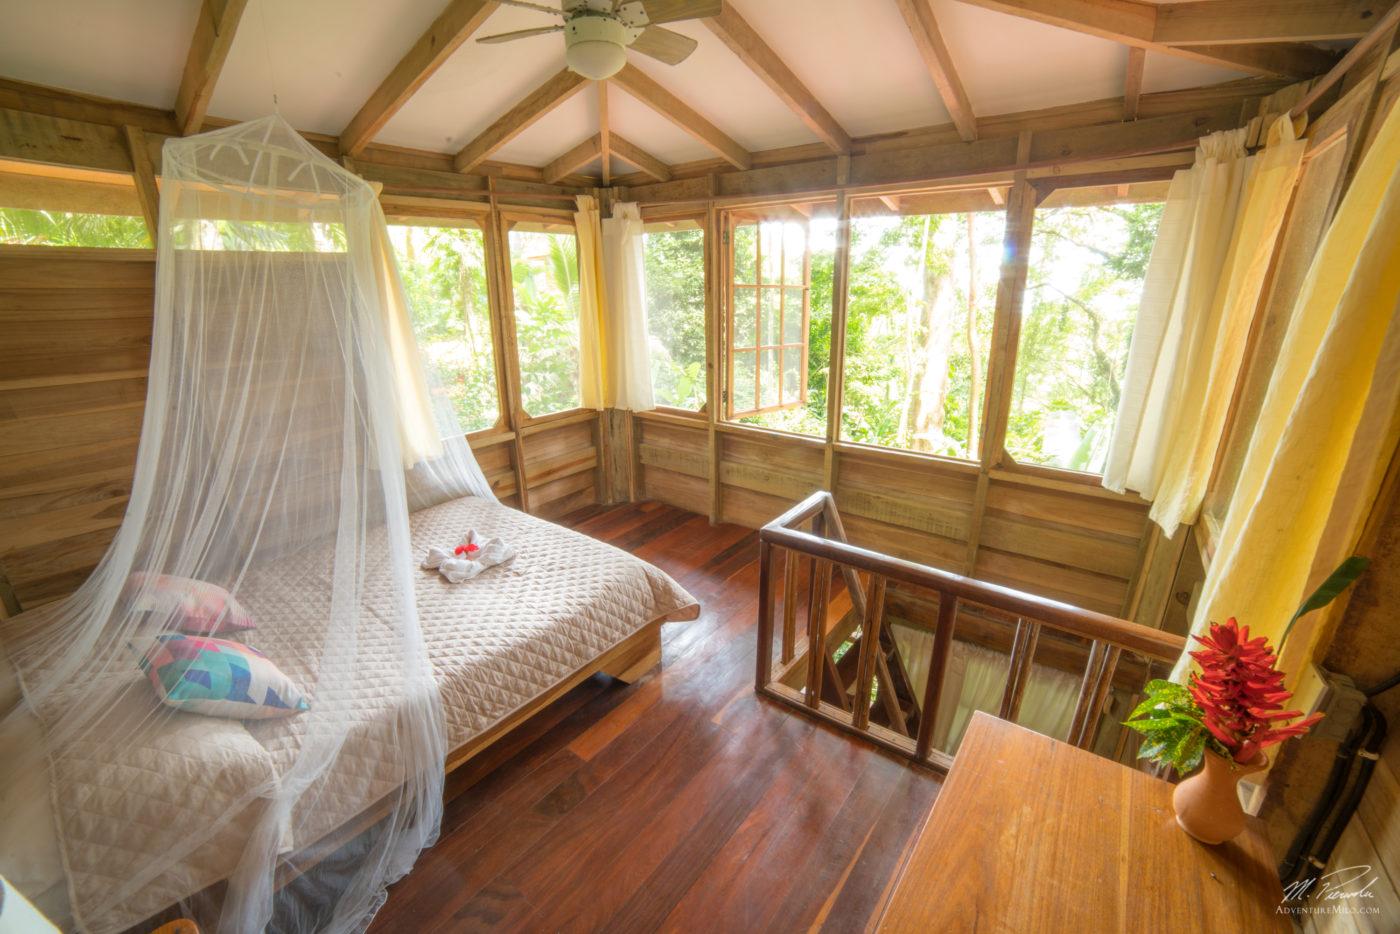 Casita at the Samasati Retreat and Rainforest Sanctuary. Photo via Samasati